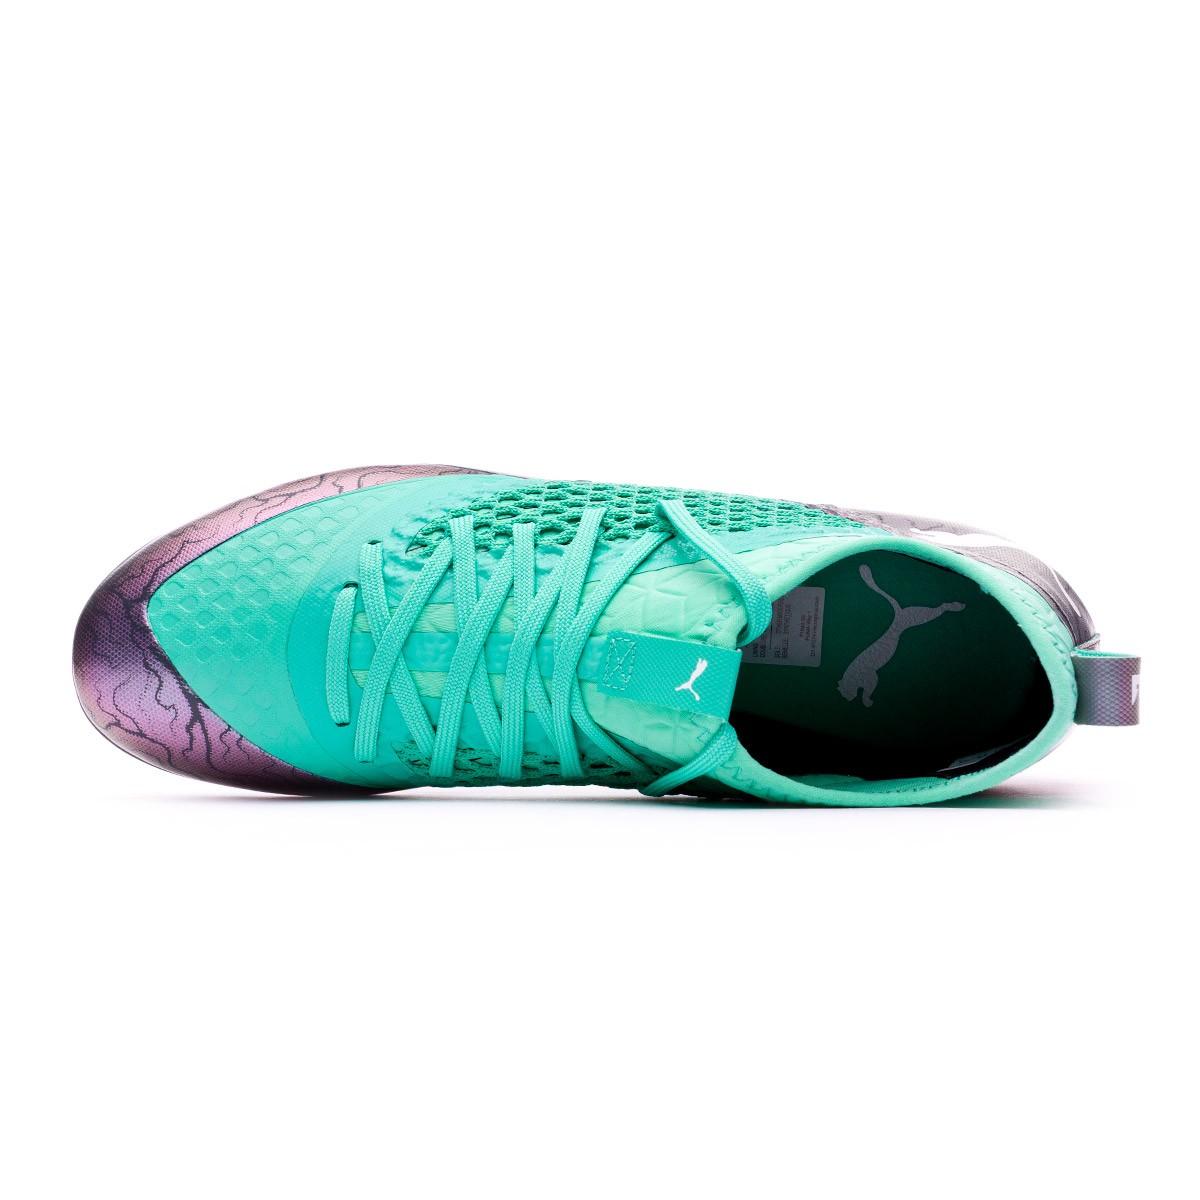 2354def7d Football Boots Puma Future 2.3 Netfit MG Shift-Biscay green-Puma white -  Football store Fútbol Emotion